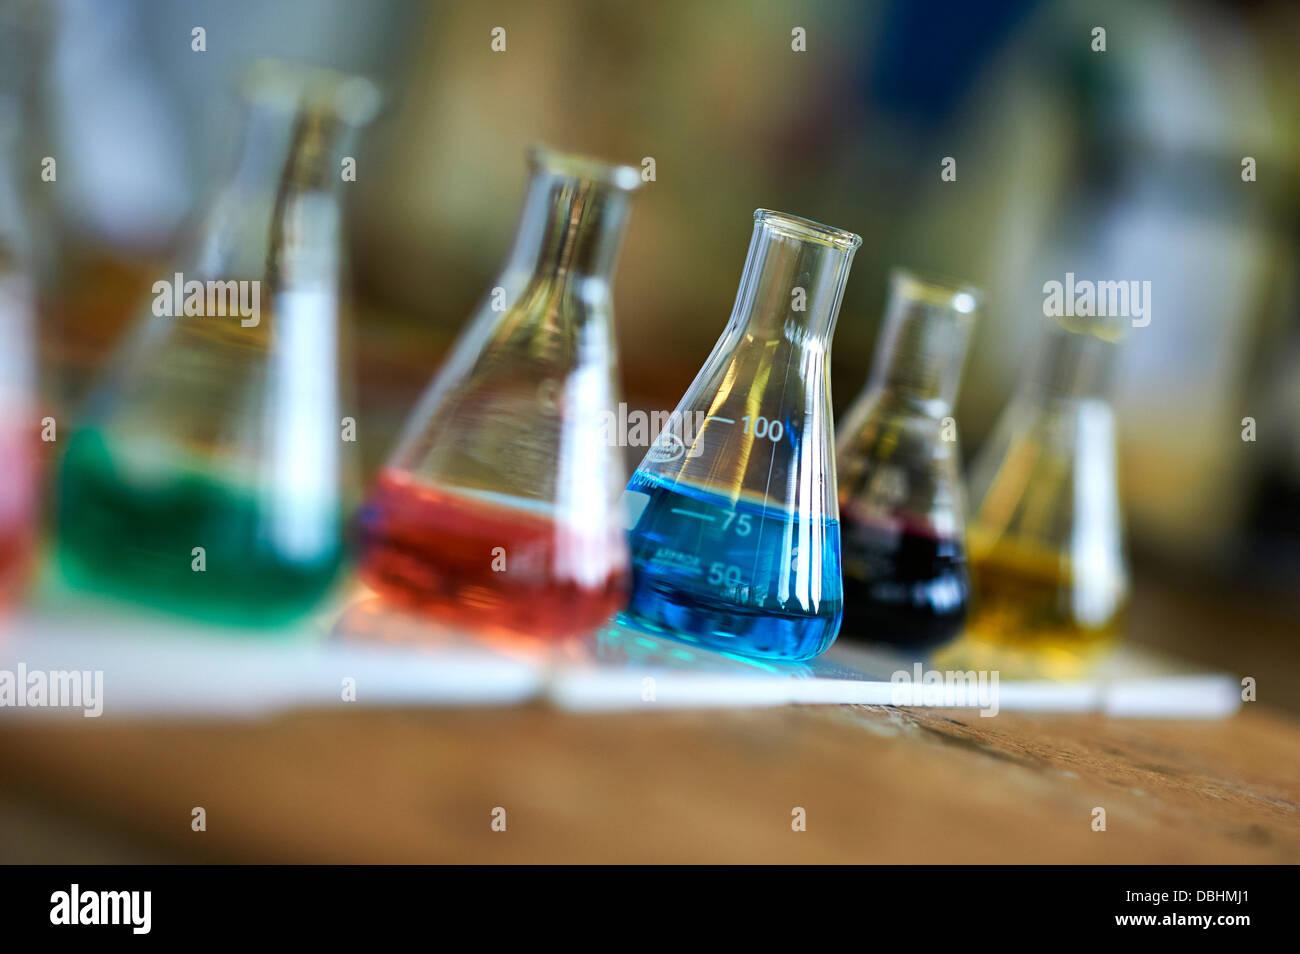 chemistry lesson - Stock Image